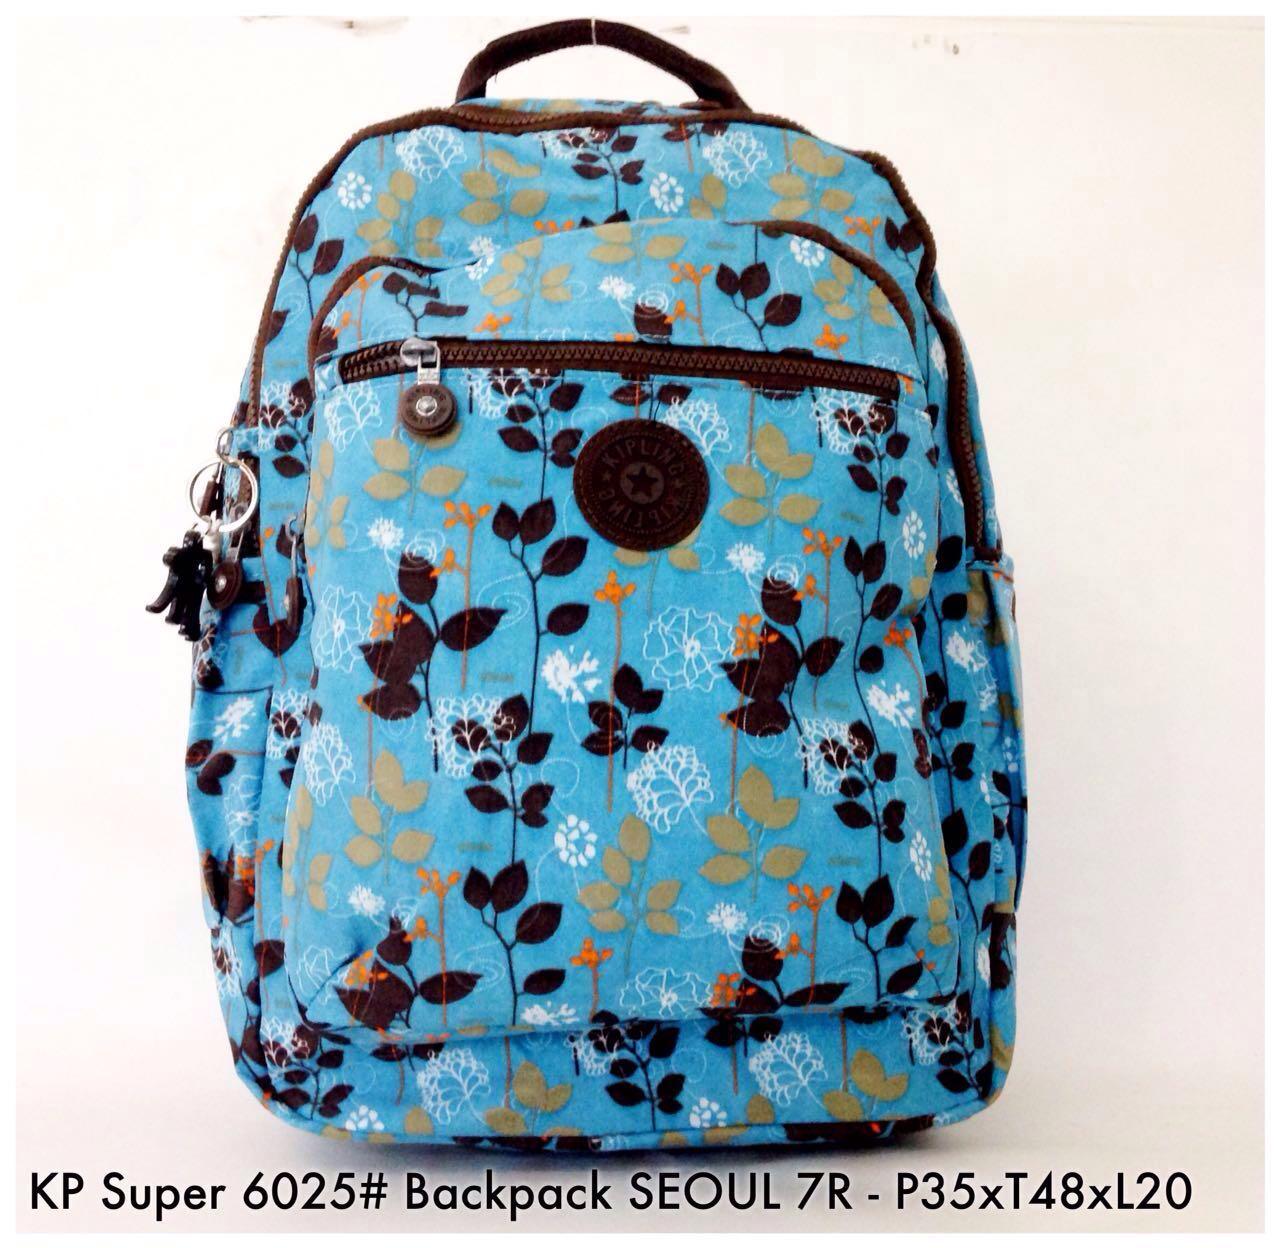 Tas Ransel Kipling Original Seoul Gold Spec Dan Daftar Harga Wanita Import Backpack  6025 8 Fesyen 32950faa53